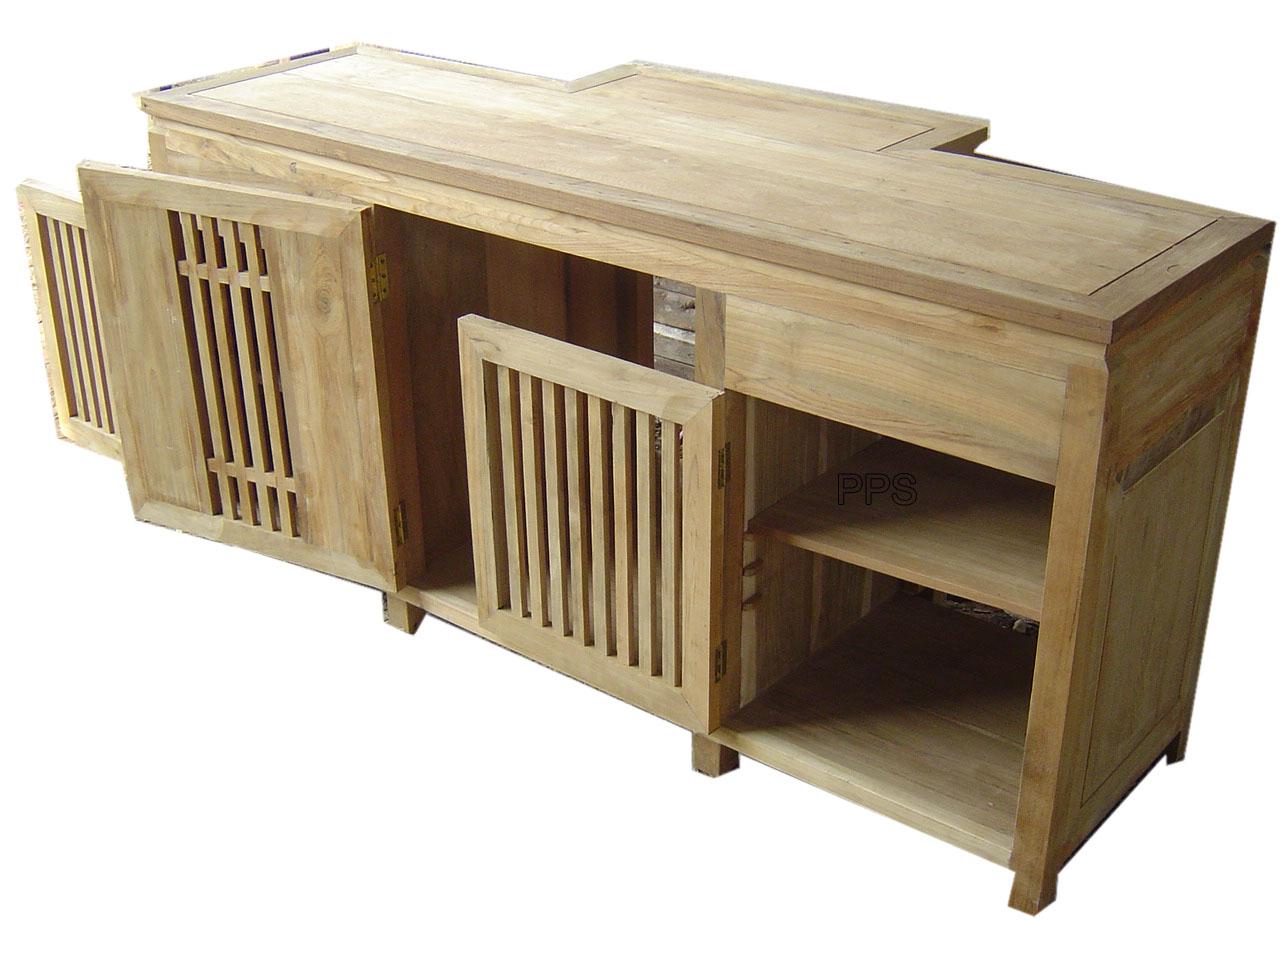 WoodShelf sn345-2